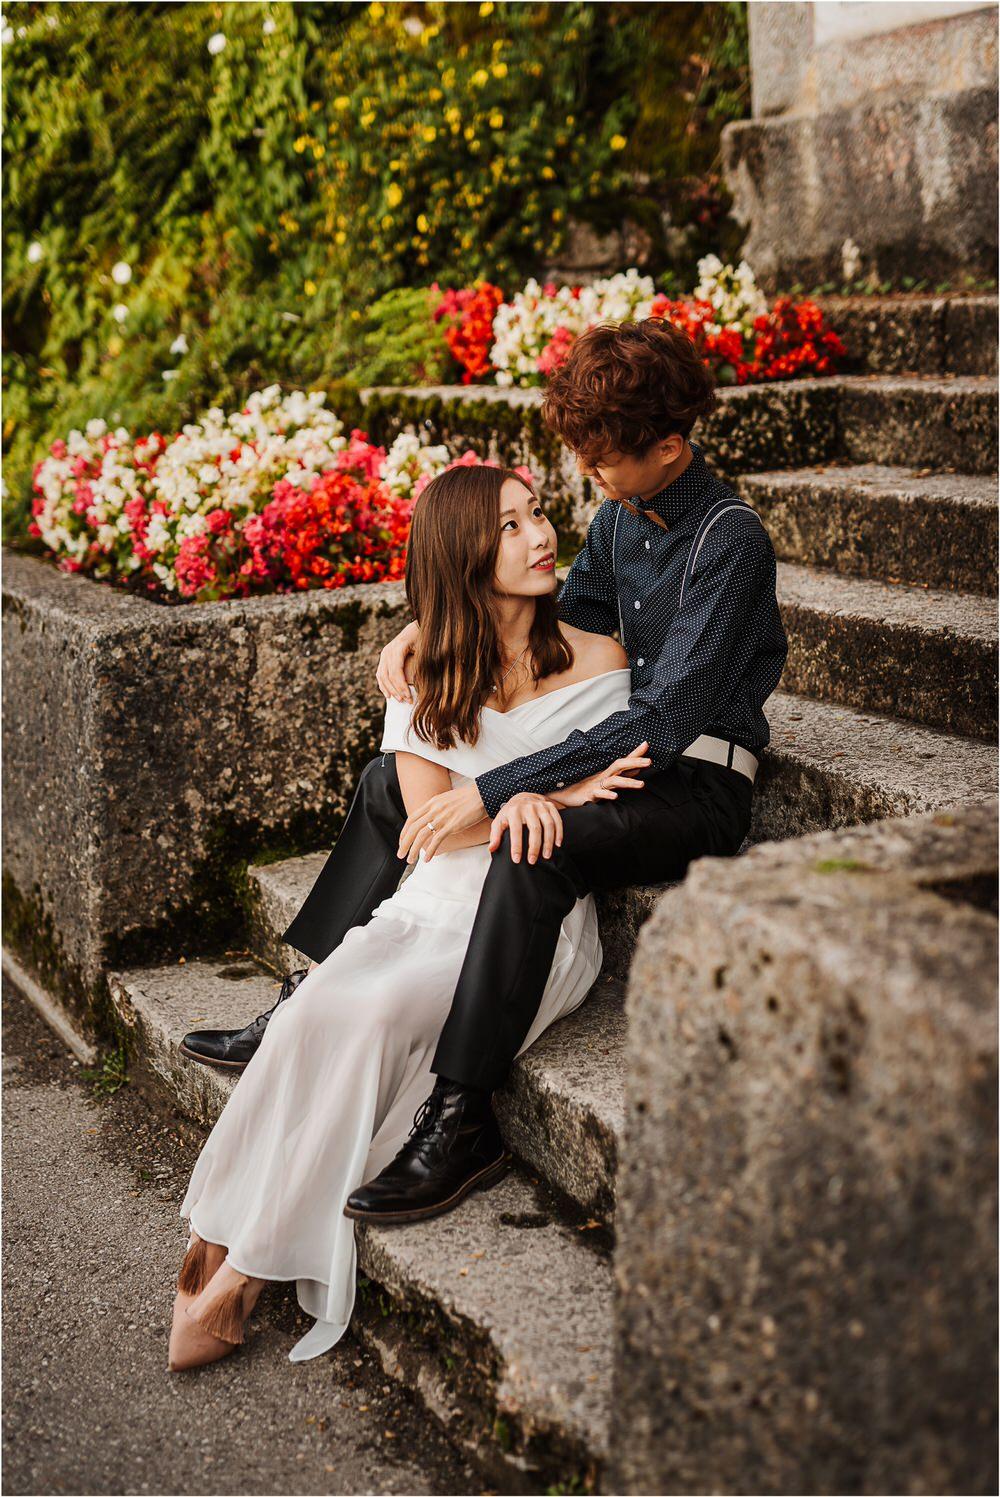 hallstatt austria wedding engagement photographer asian proposal surprise photography recommended nature professional 0032.jpg